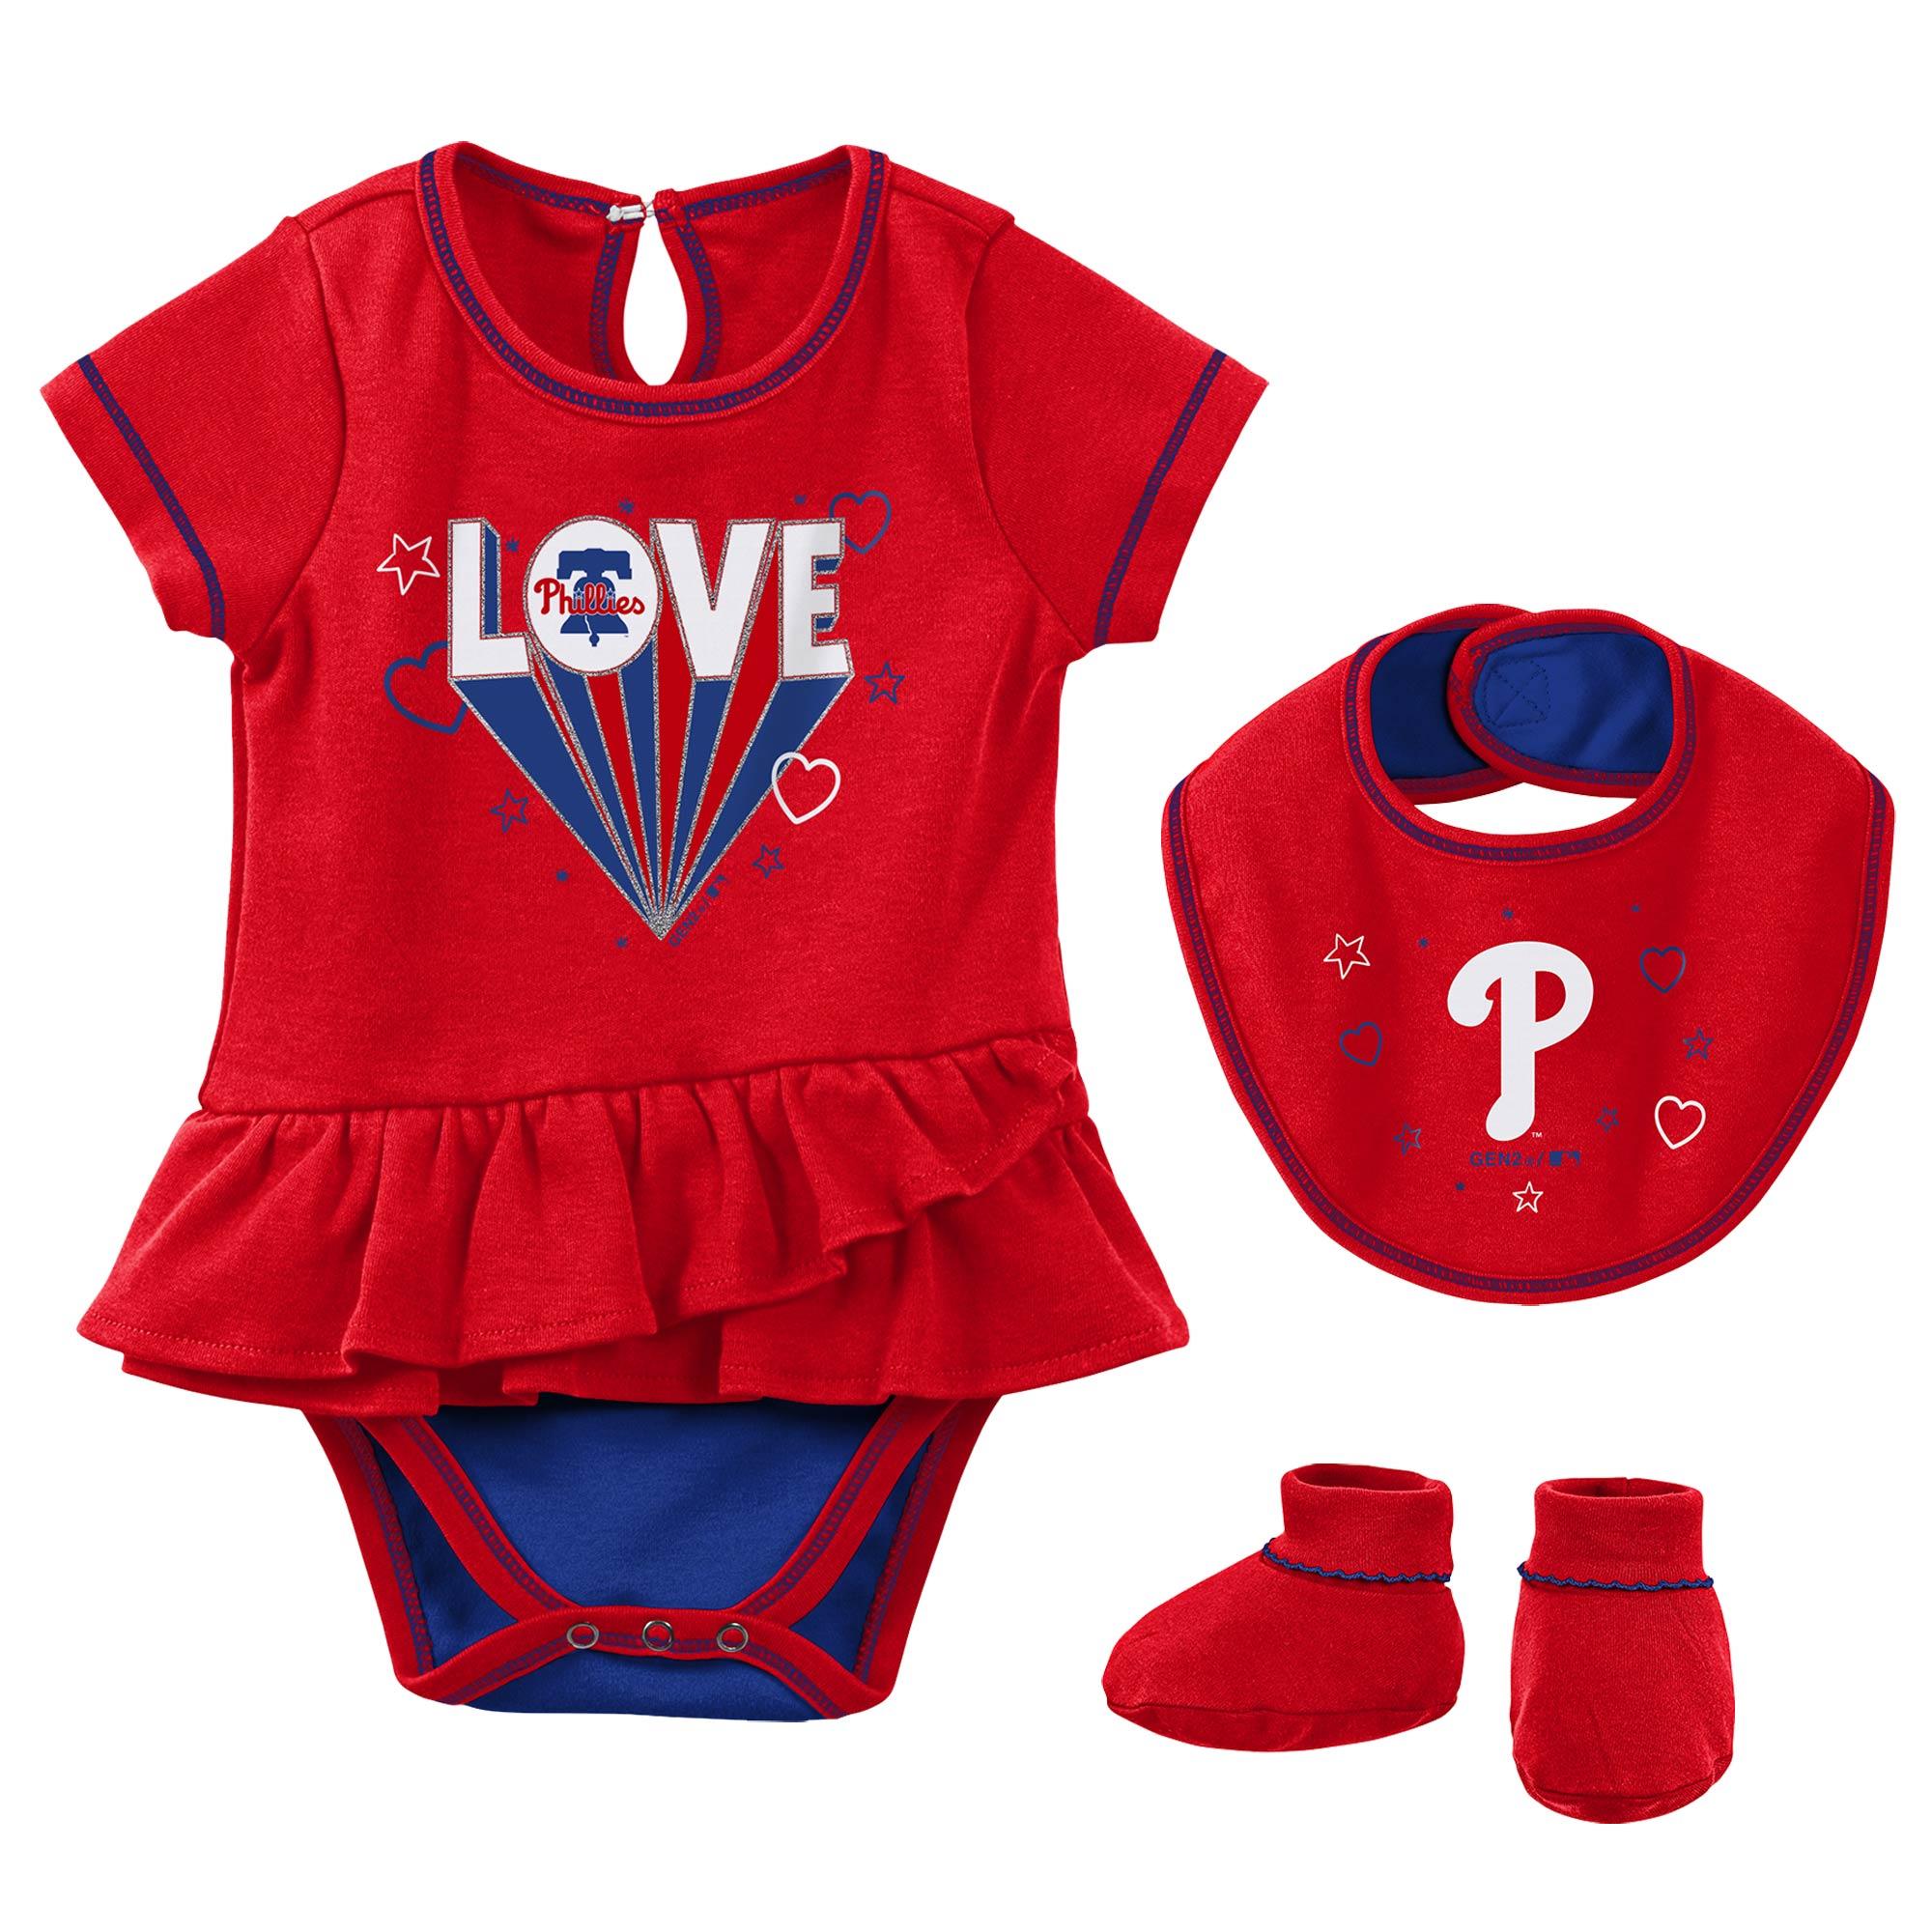 Philadelphia Phillies Girls Newborn & Infant Play Your Best Bodysuit, Bib & Booties Set - Red